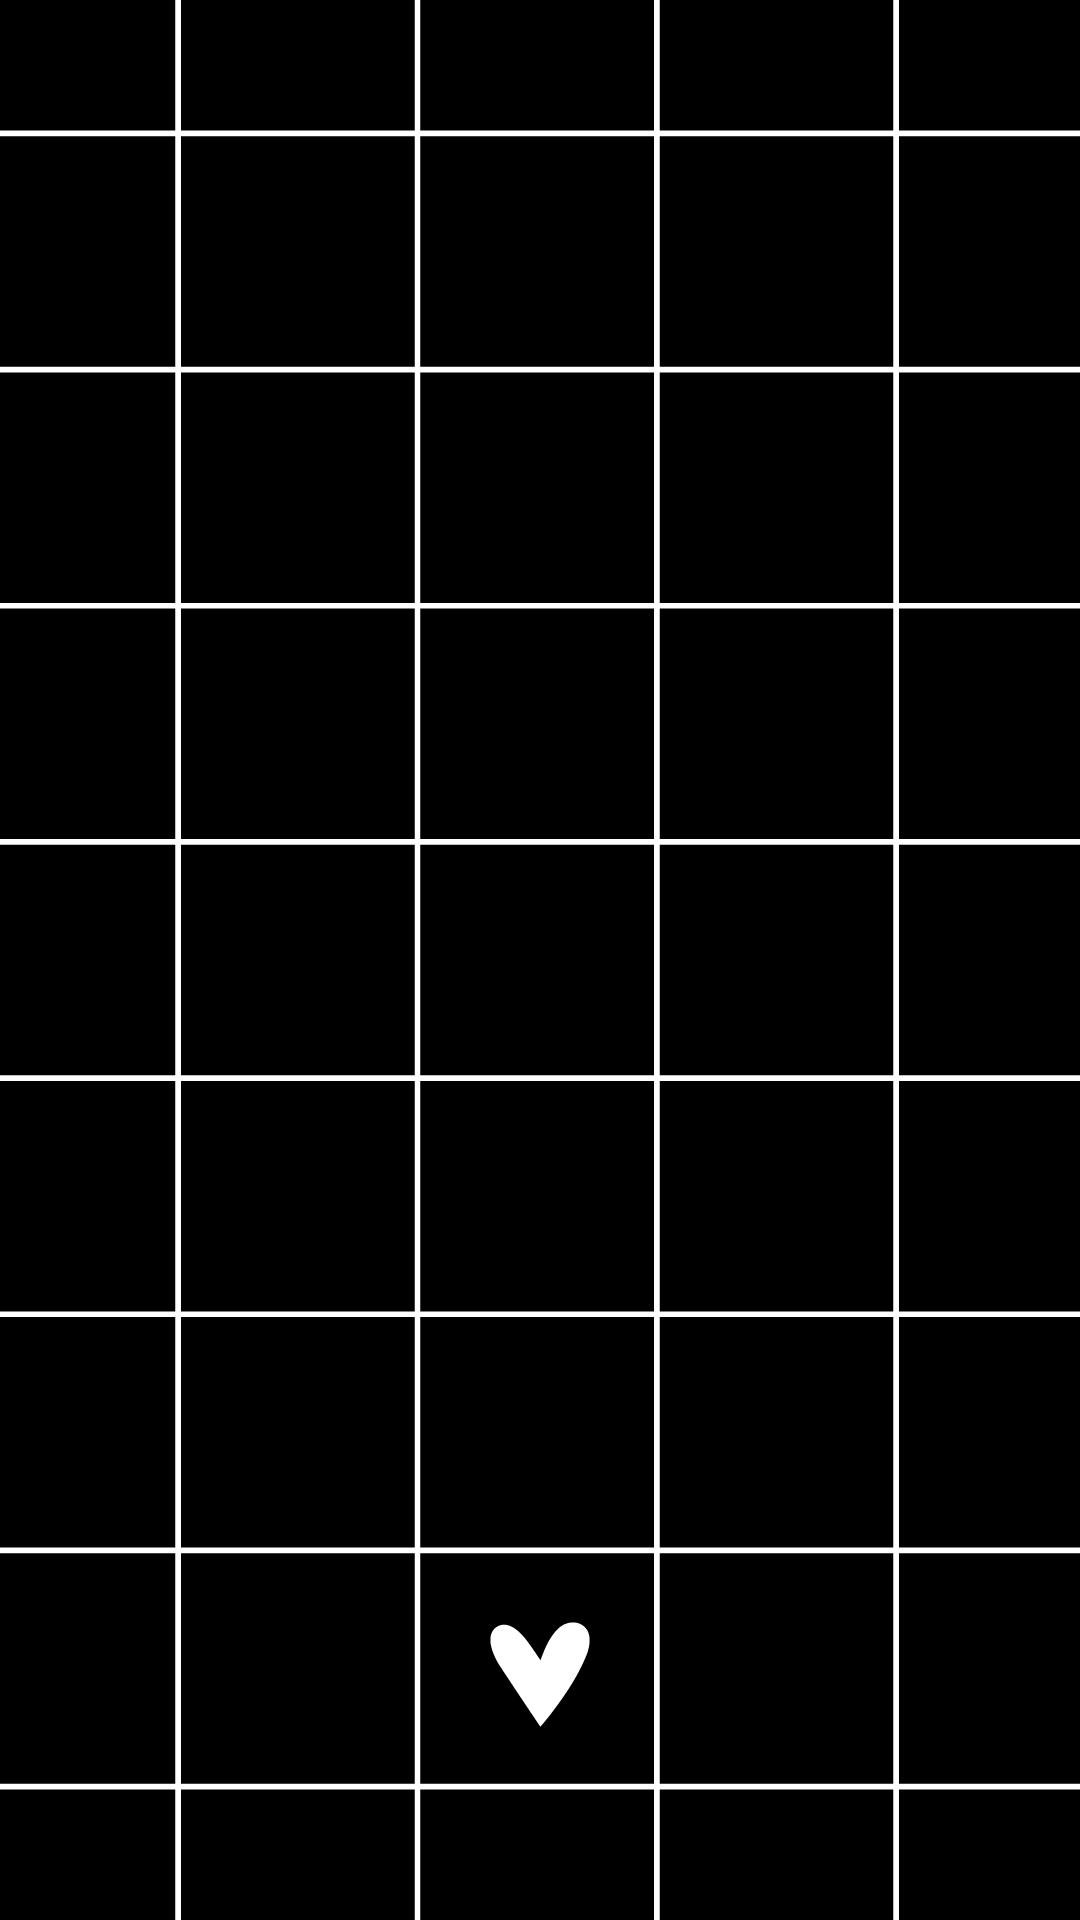 Wallpaper Black Grid Mrs Dreamer Papel De Parede Wallpaper Papel De Parede De Ouro Papel De Parede Xadrez